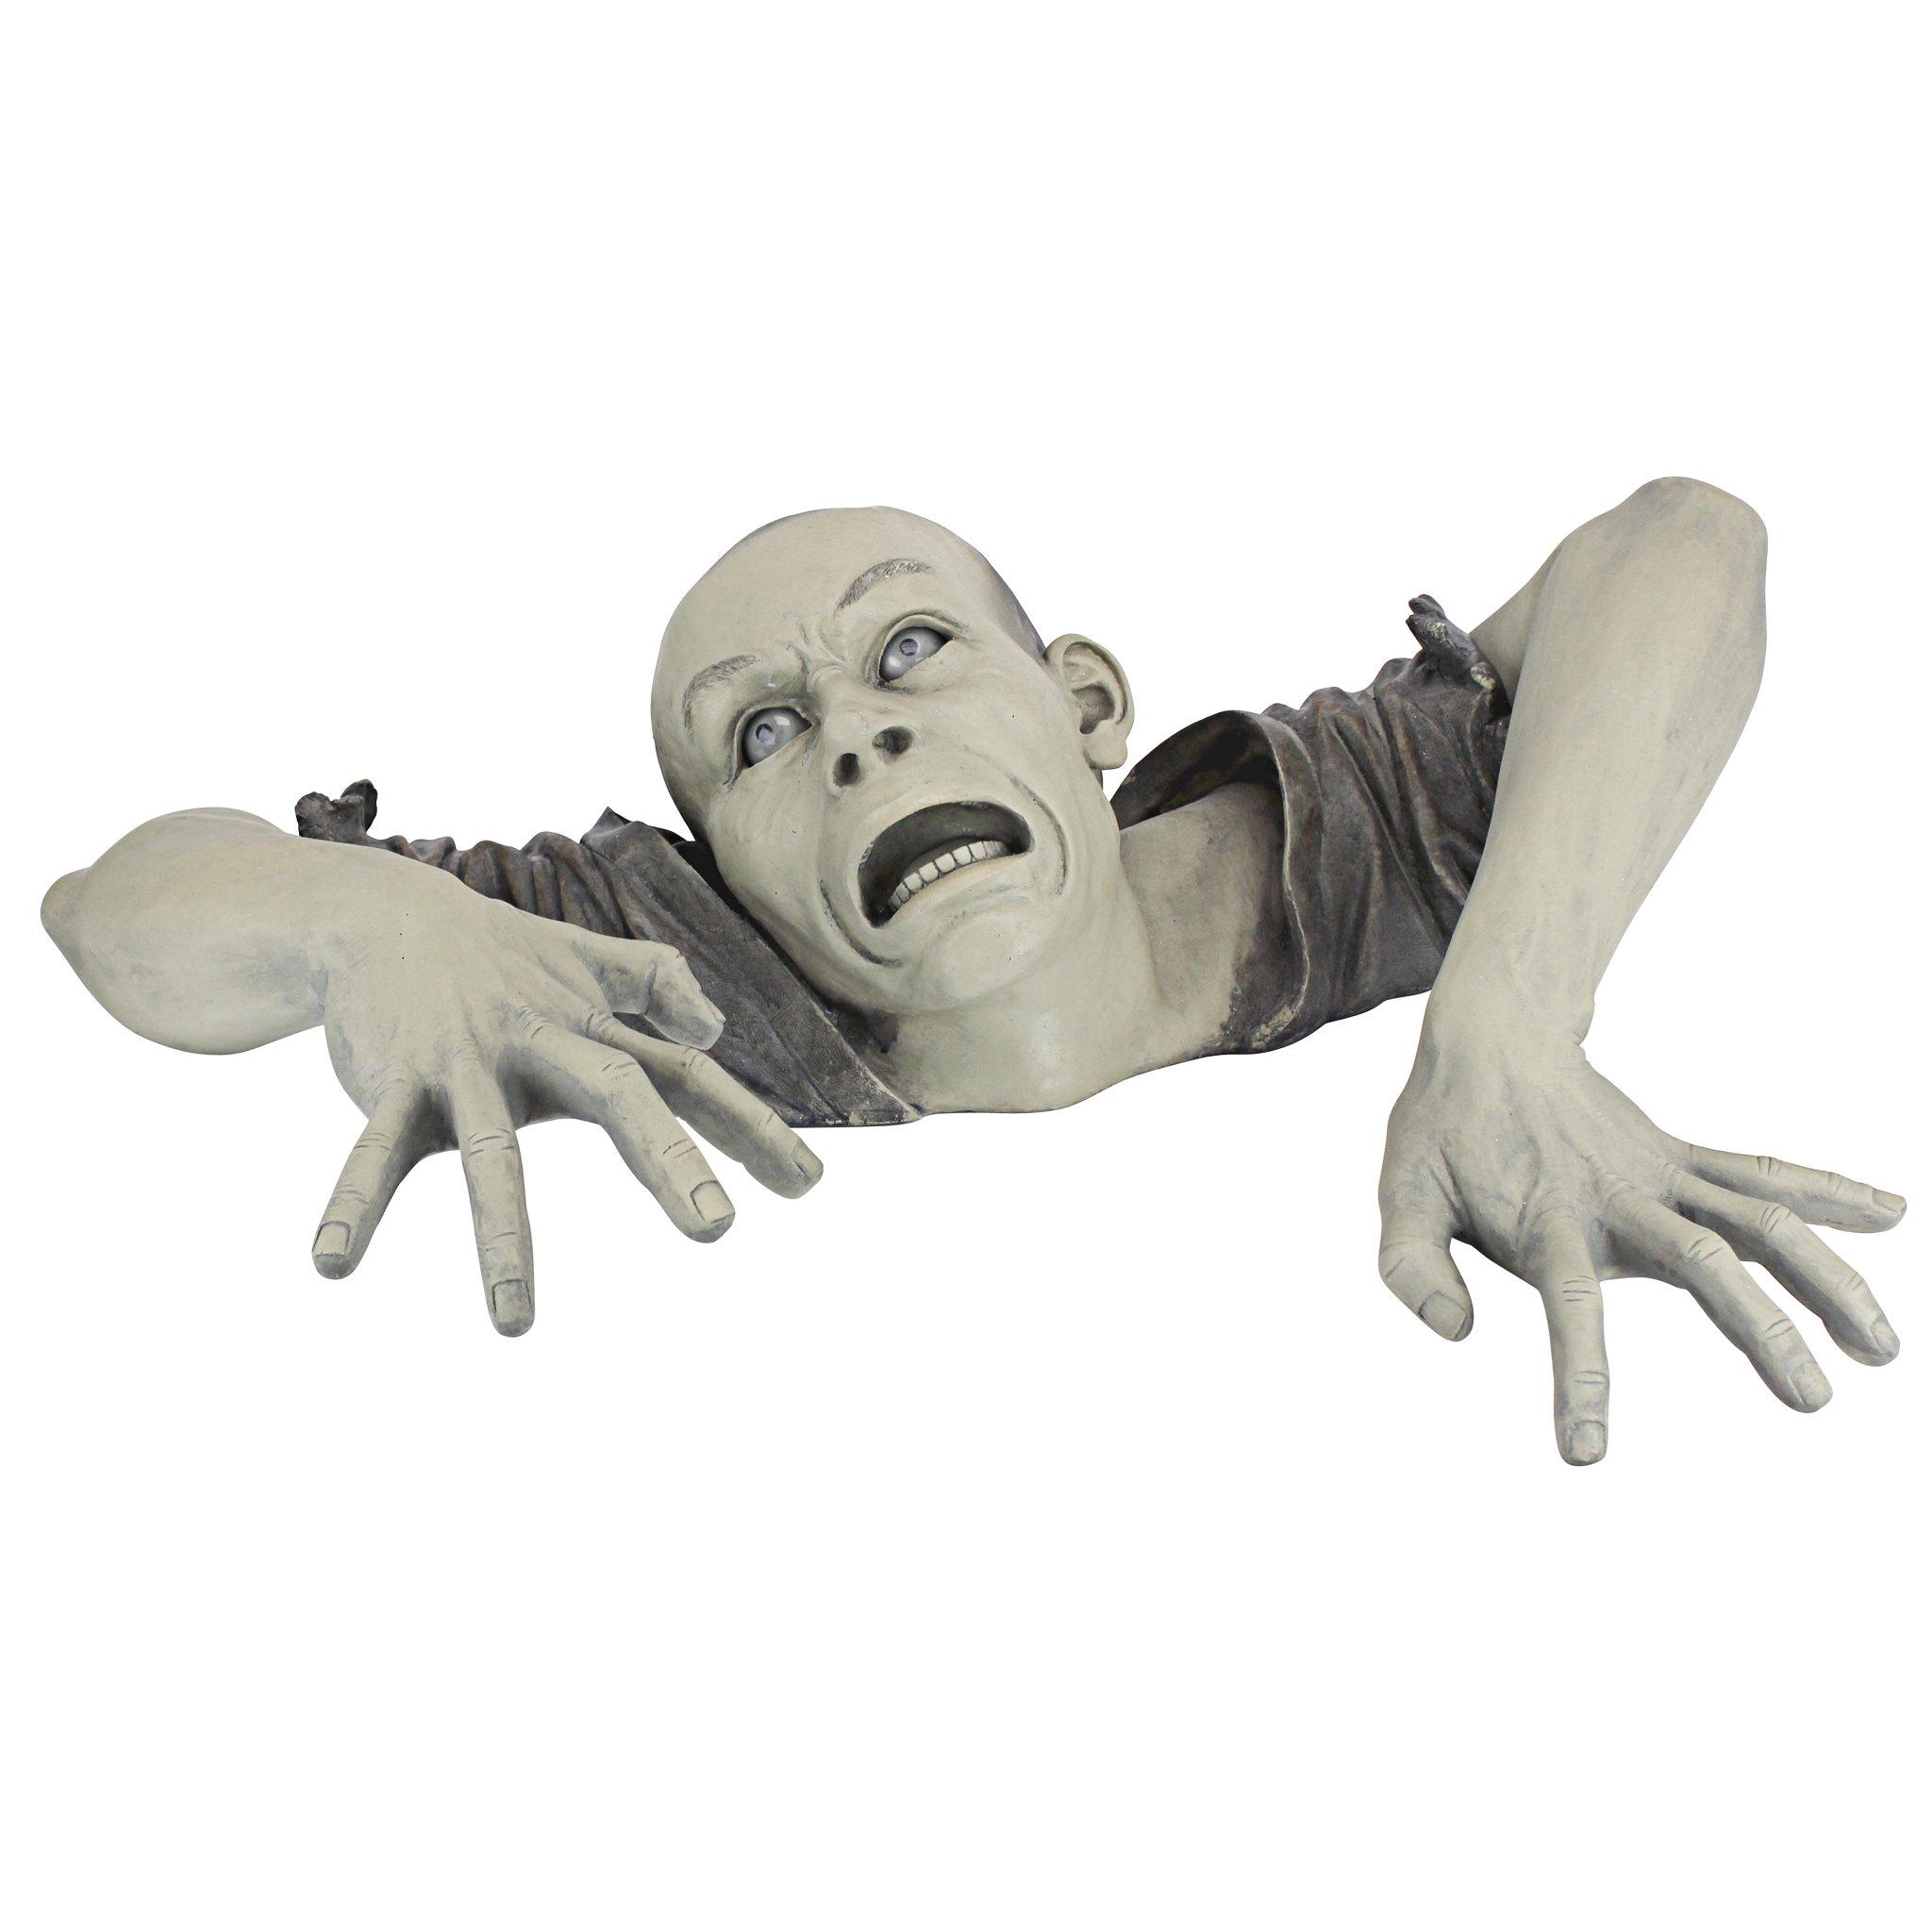 The Zombie of Montclaire Moors Garden Statue - Zombie Decorations - Zombie Statue - Halloween Decoration by Design Toscano